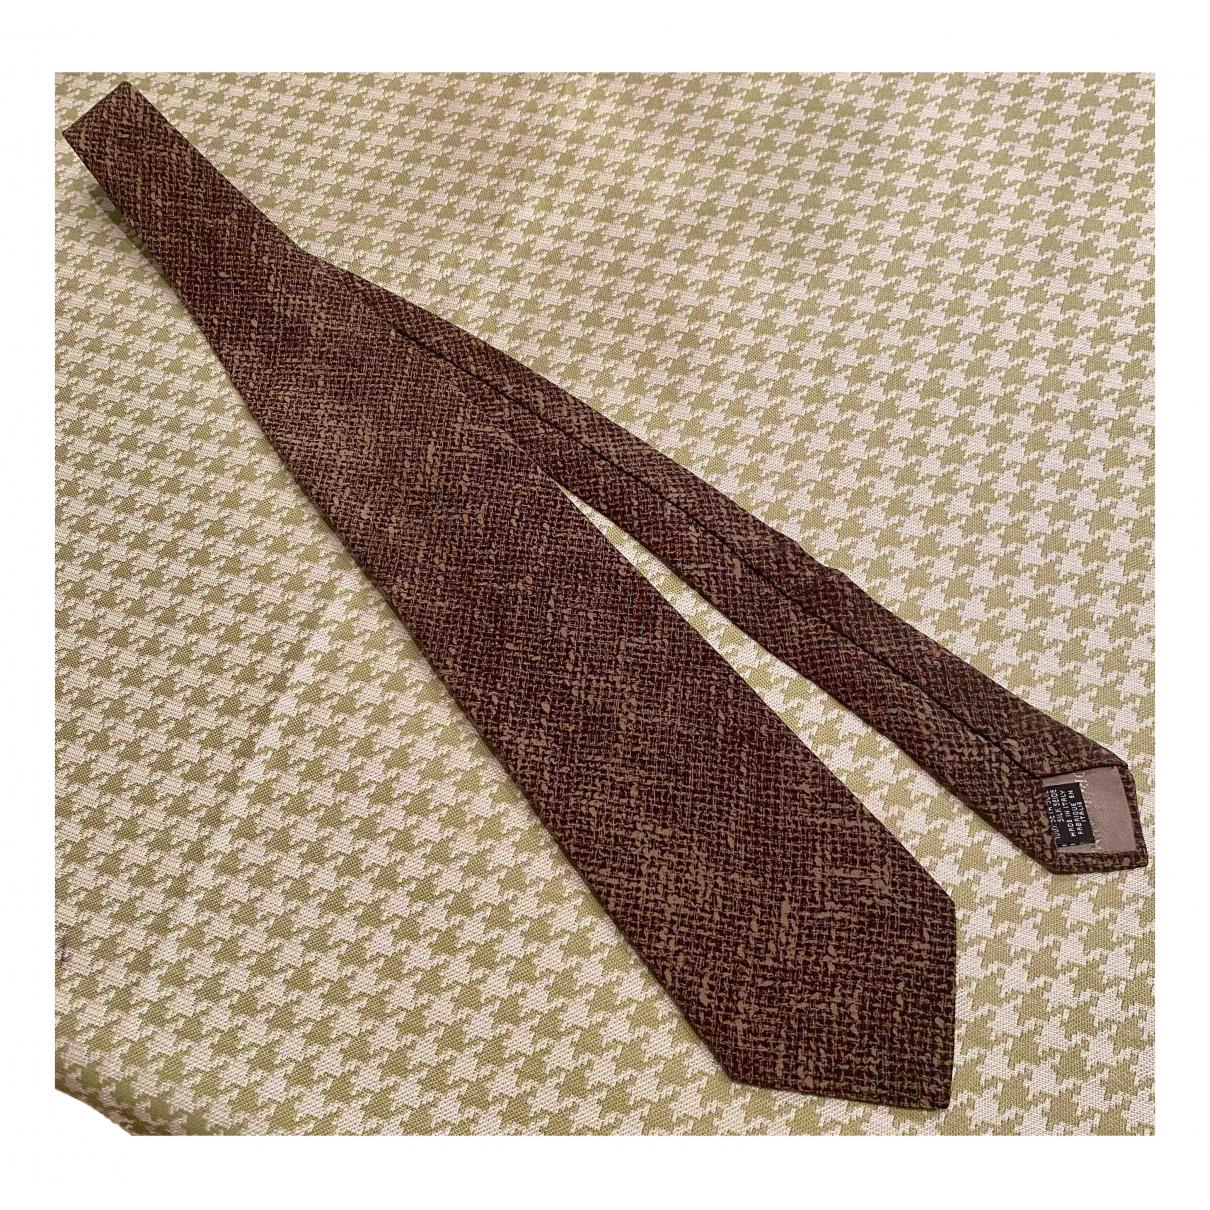 Giorgio Armani - Cravates   pour homme en soie - marron